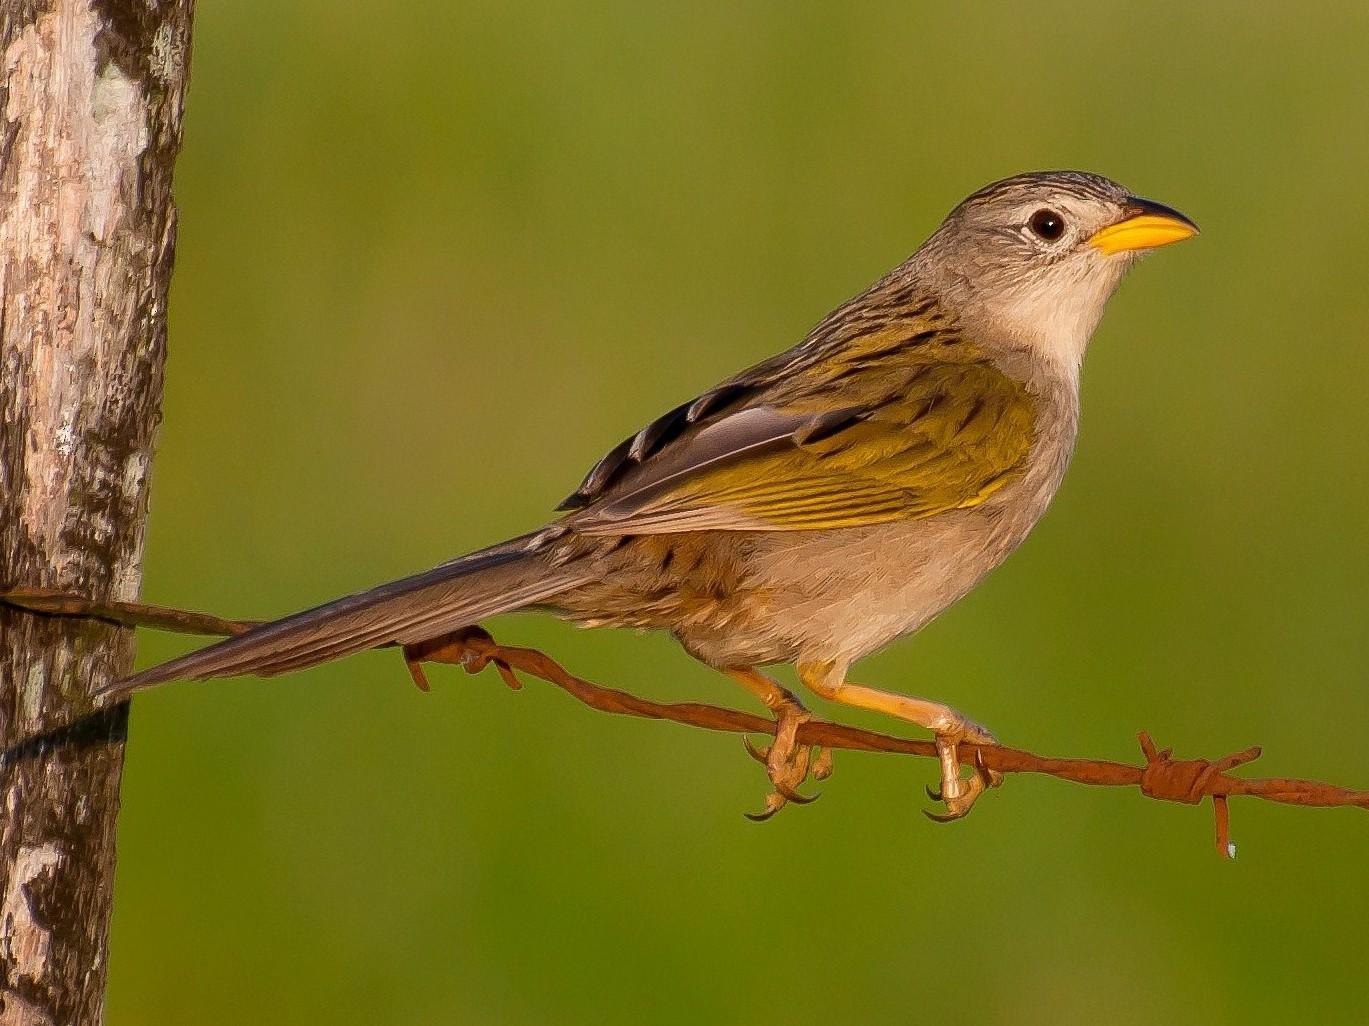 Wedge-tailed Grass-Finch - Marcos Eugênio Birding Guide